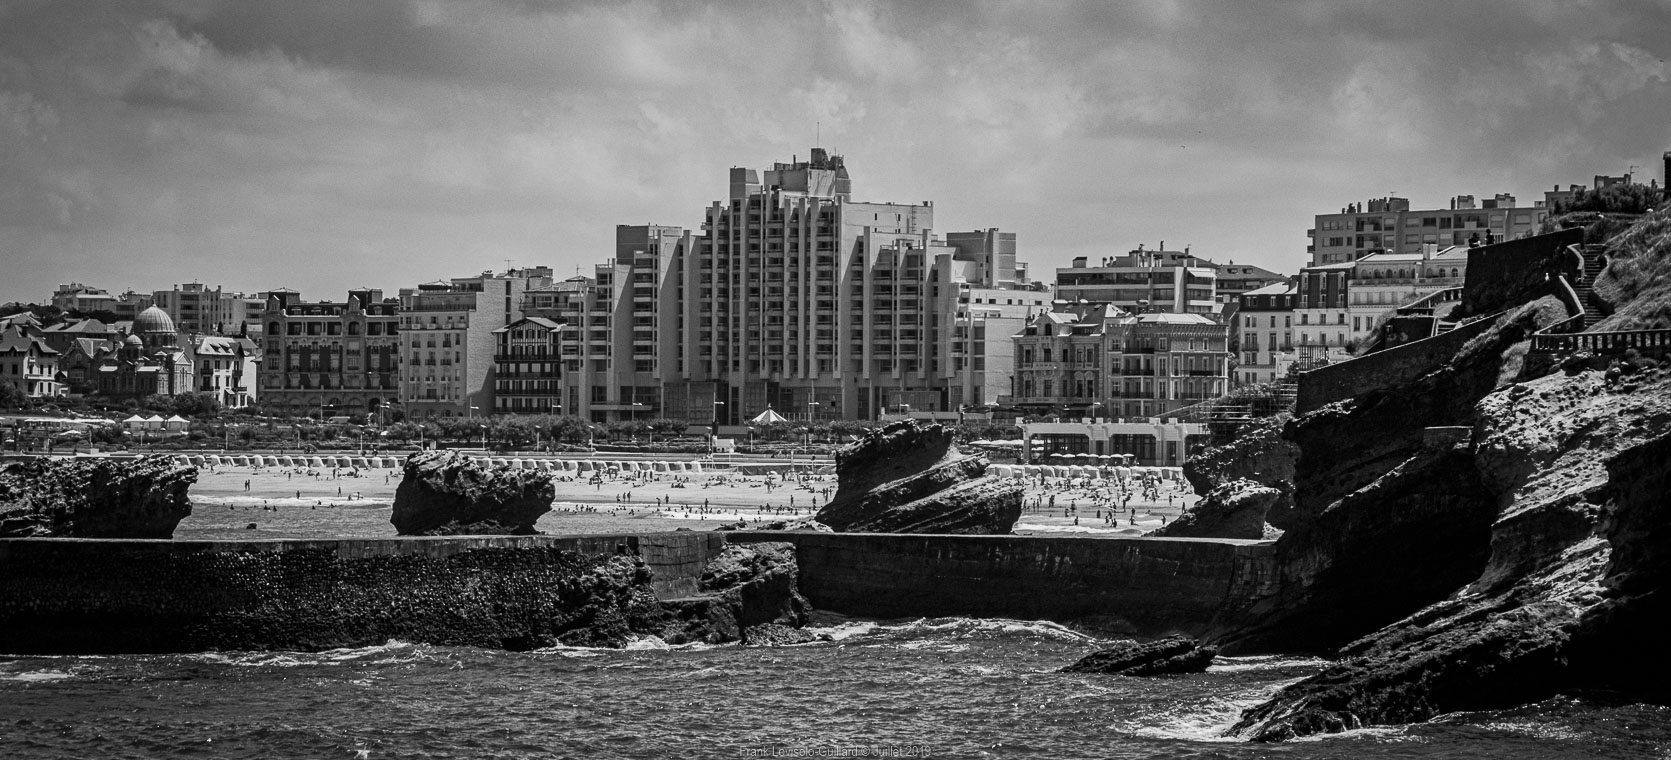 biarritz n 084